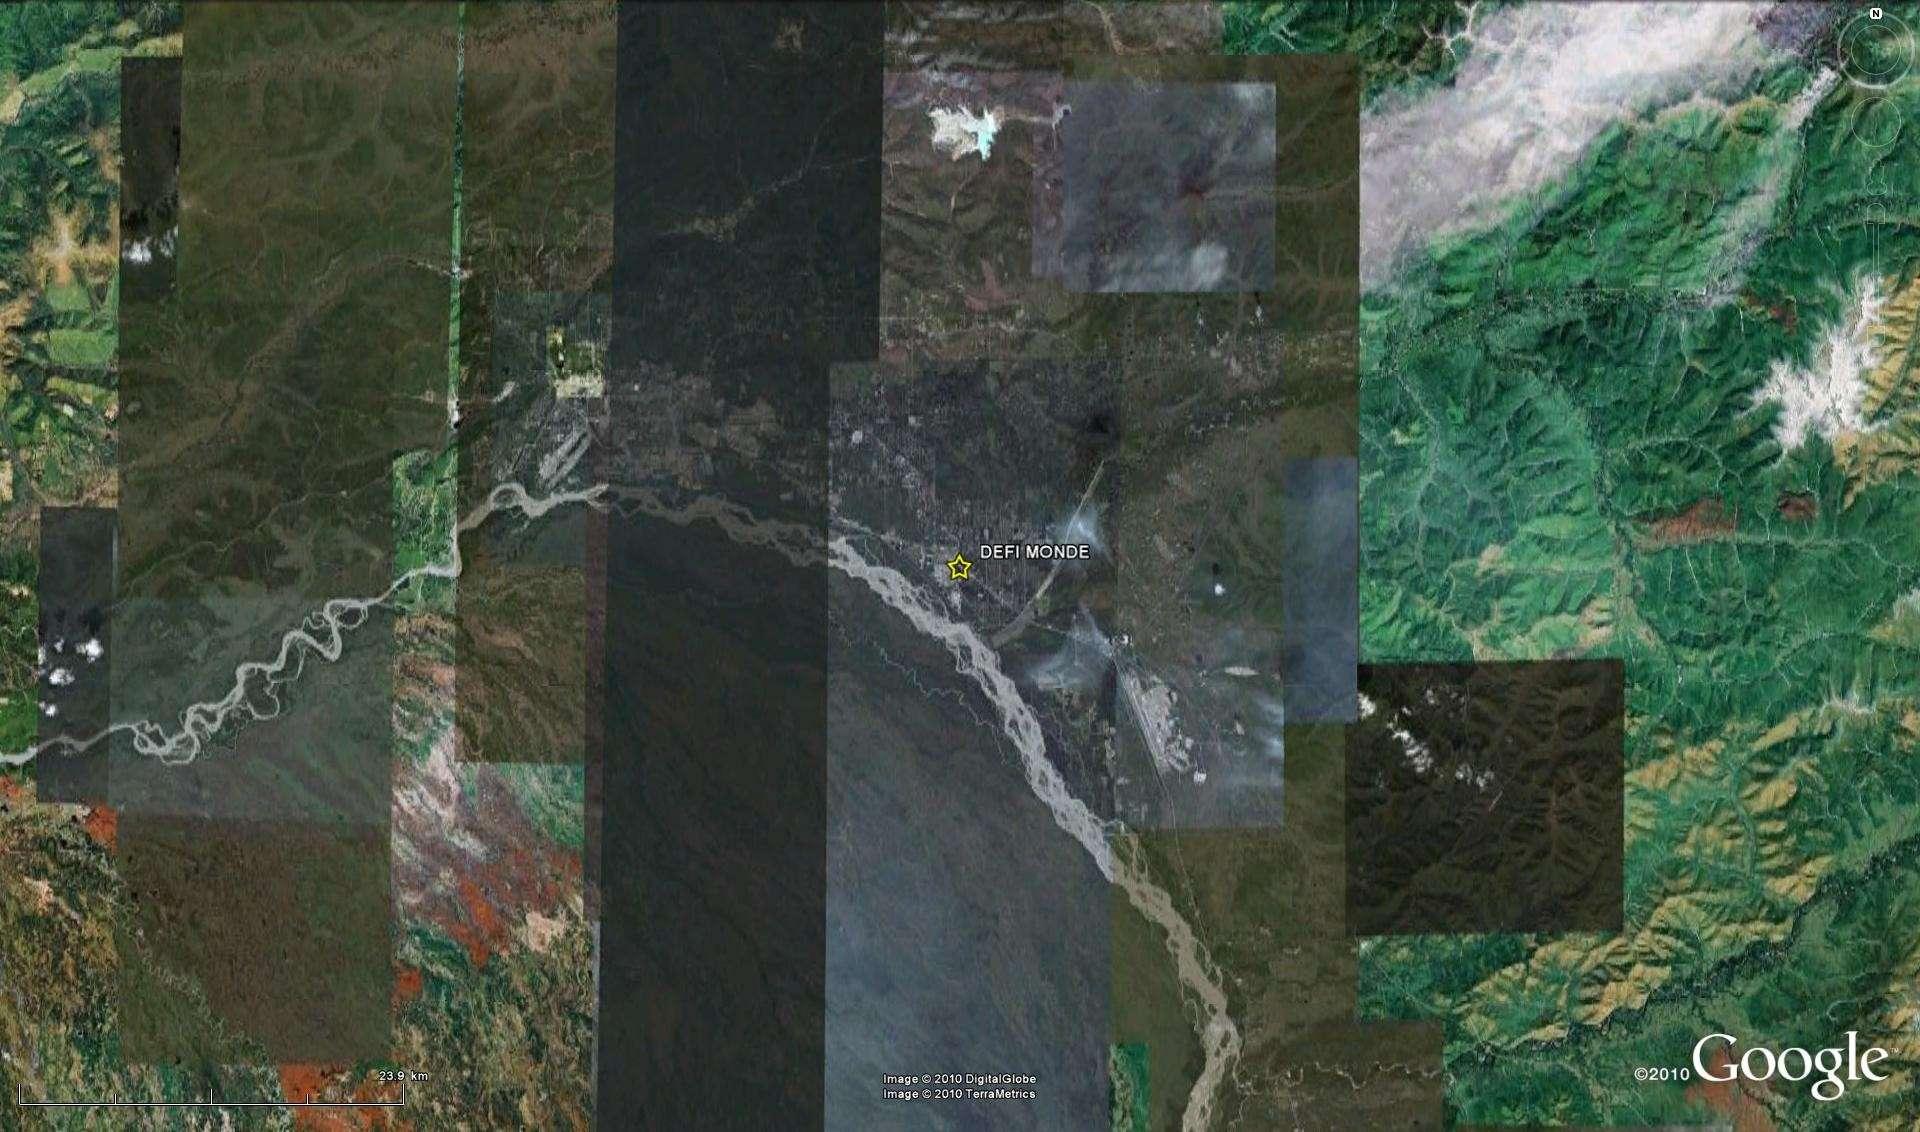 DEFIS ZOOOOOOM Monde A157 à B036 (Août 2010/Septembre 2011) - Page 26 Defimo13